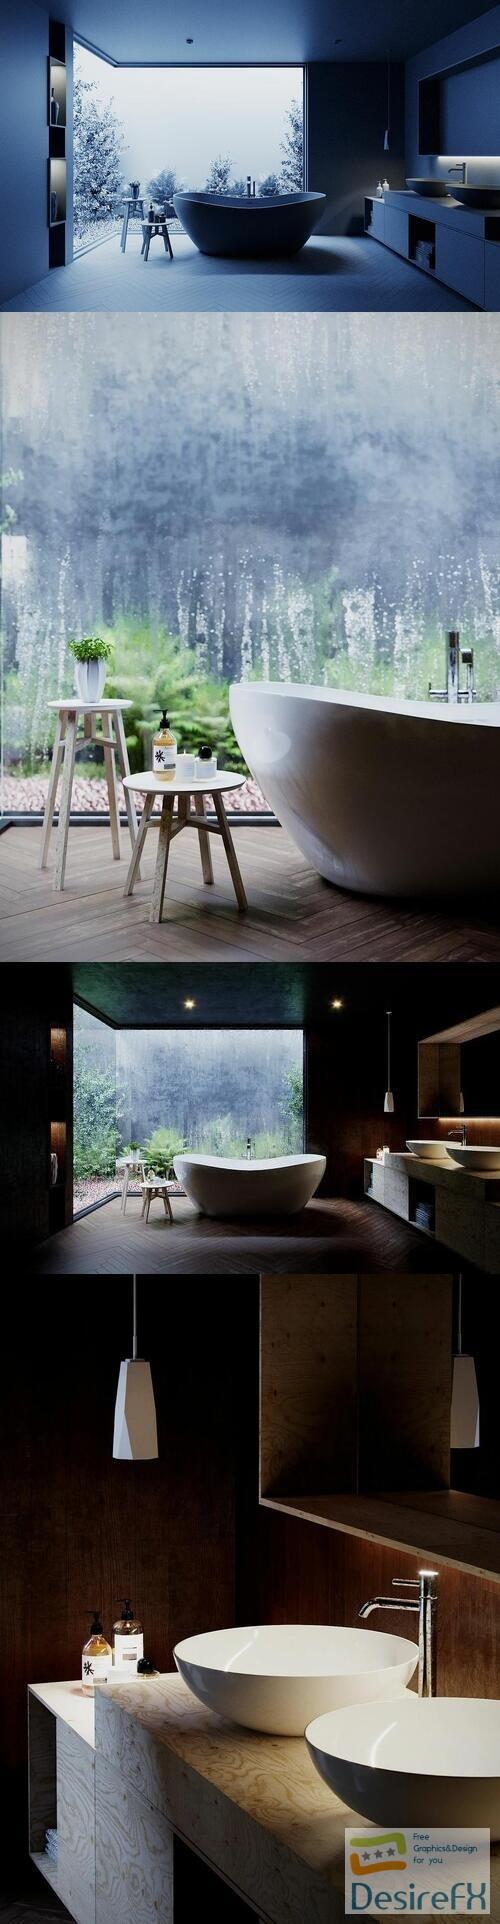 Tropical Bathroom - Cinema 4D Corona Renderer 3D Model